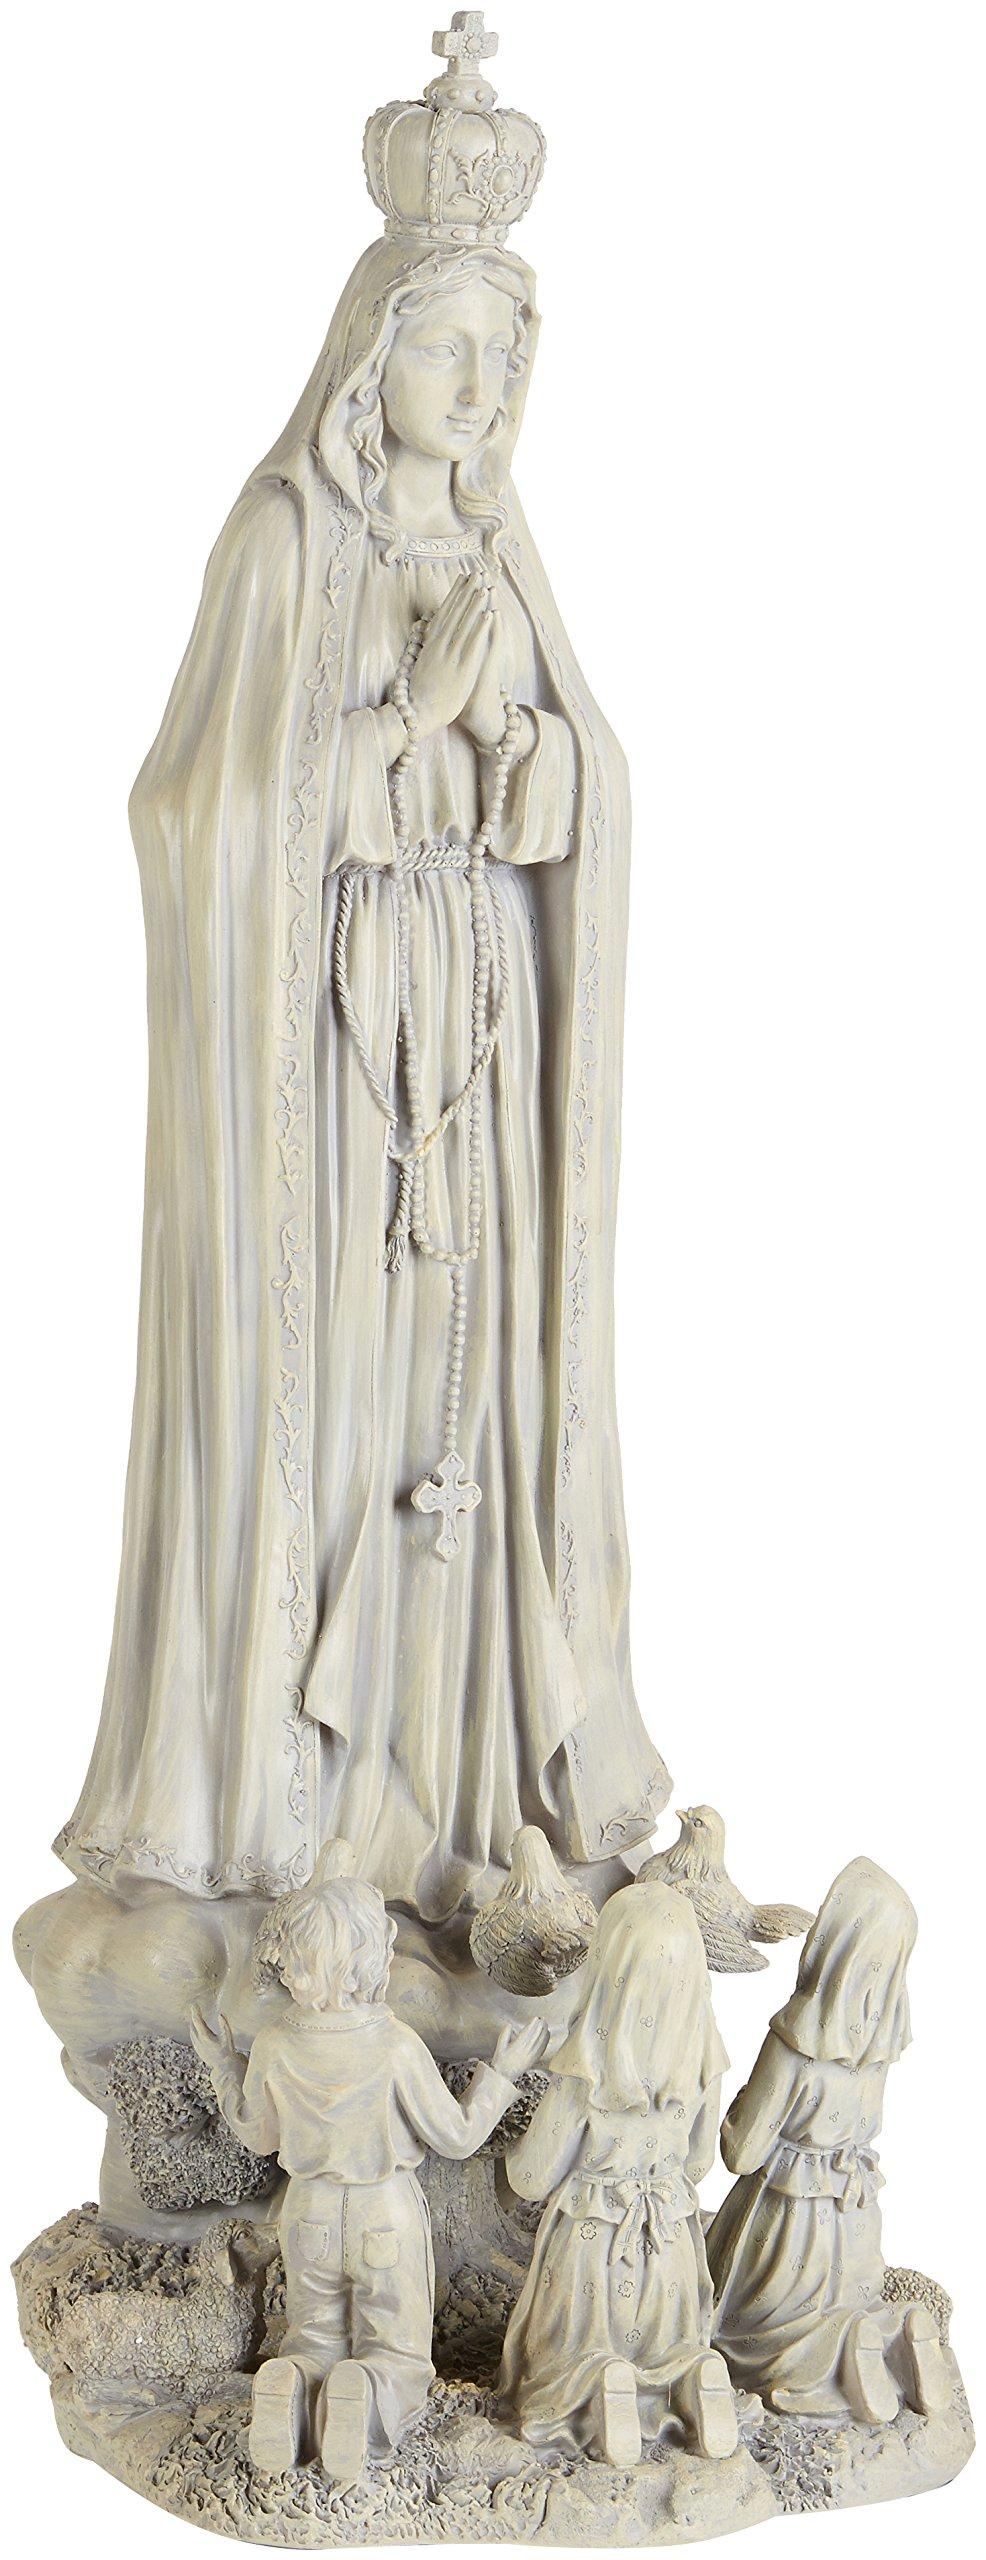 Design Toscano Our Lady of Fatima Grand Scale Statue by Design Toscano